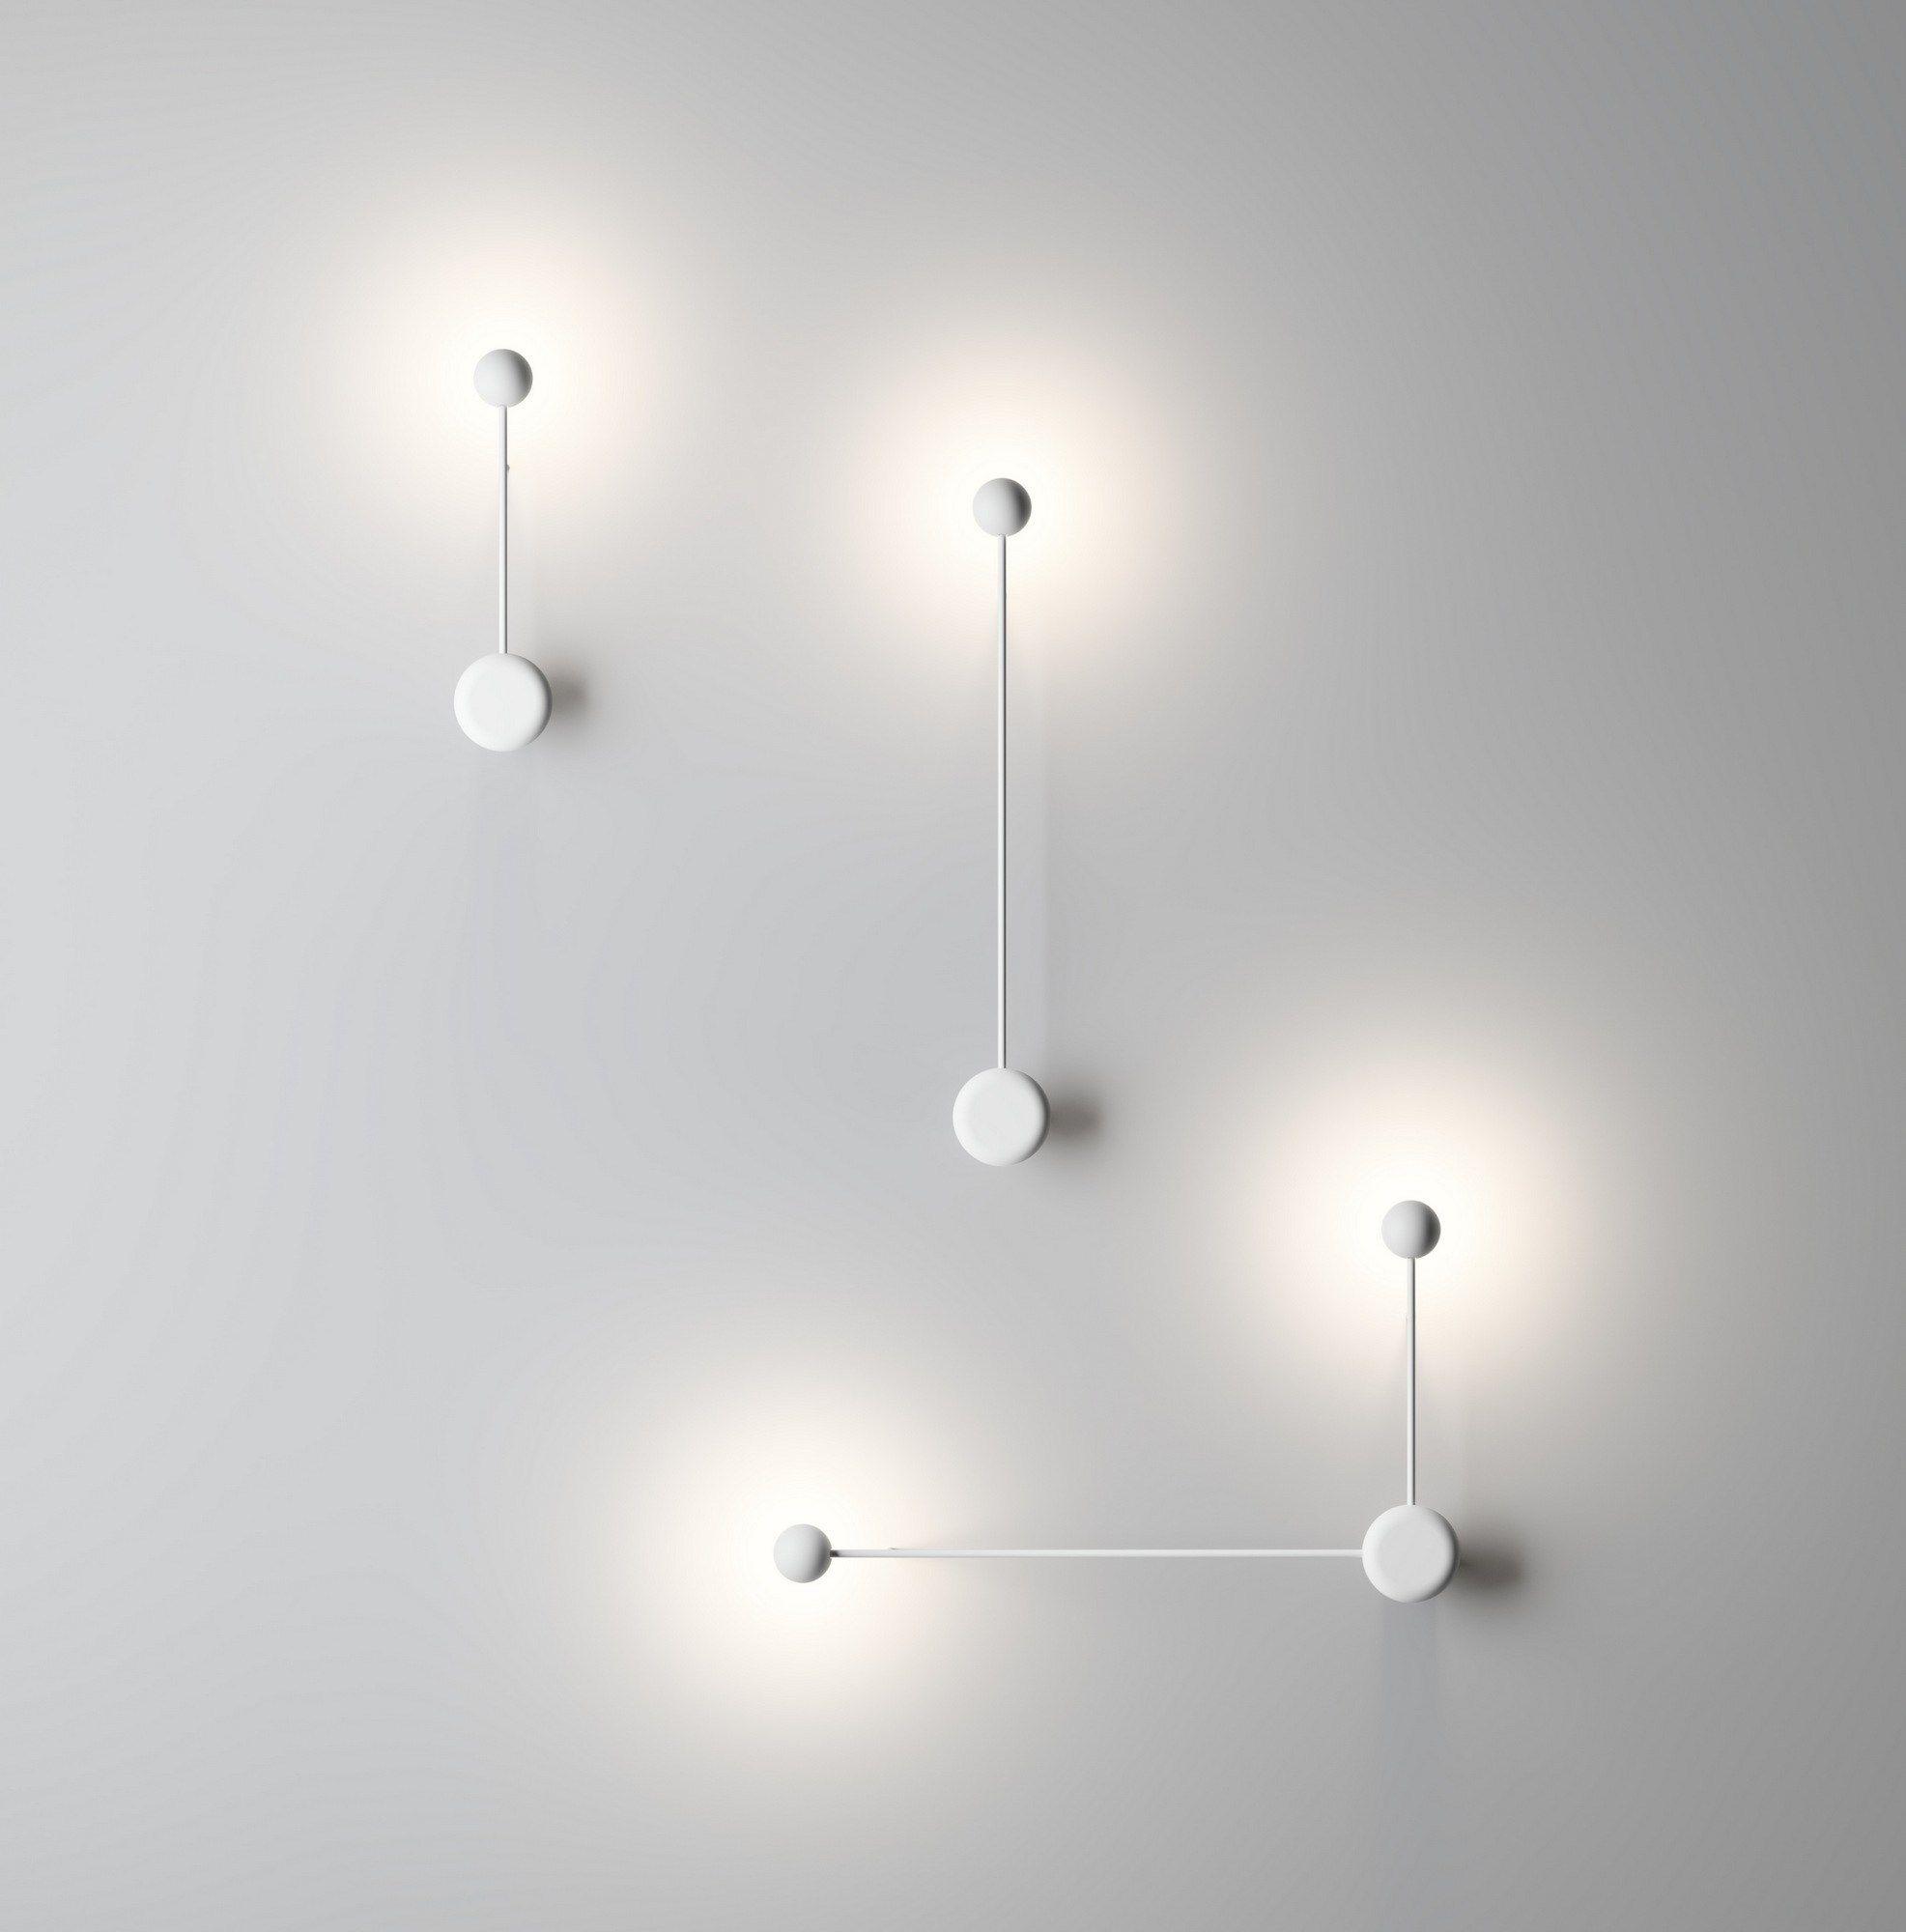 Lampada da parete a led orientabile collezione pin by vibia design ichiro iwasaki lights - Lampada parete design ...